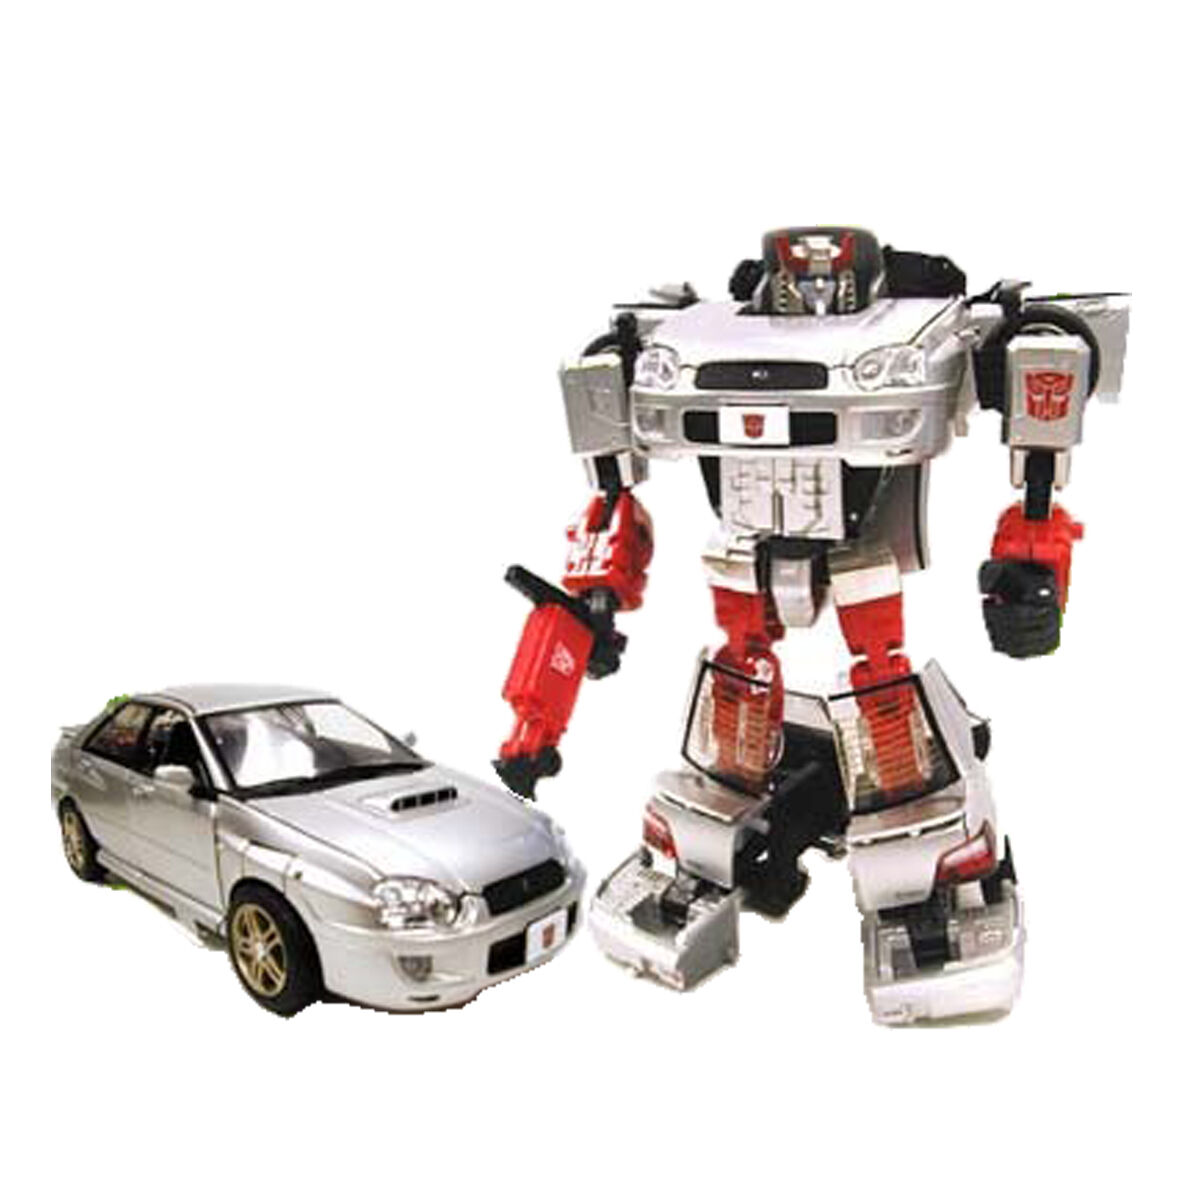 Binaltech BT-03 Streak Feat Impreza WRX  carrozzeria in metallo - Transformers